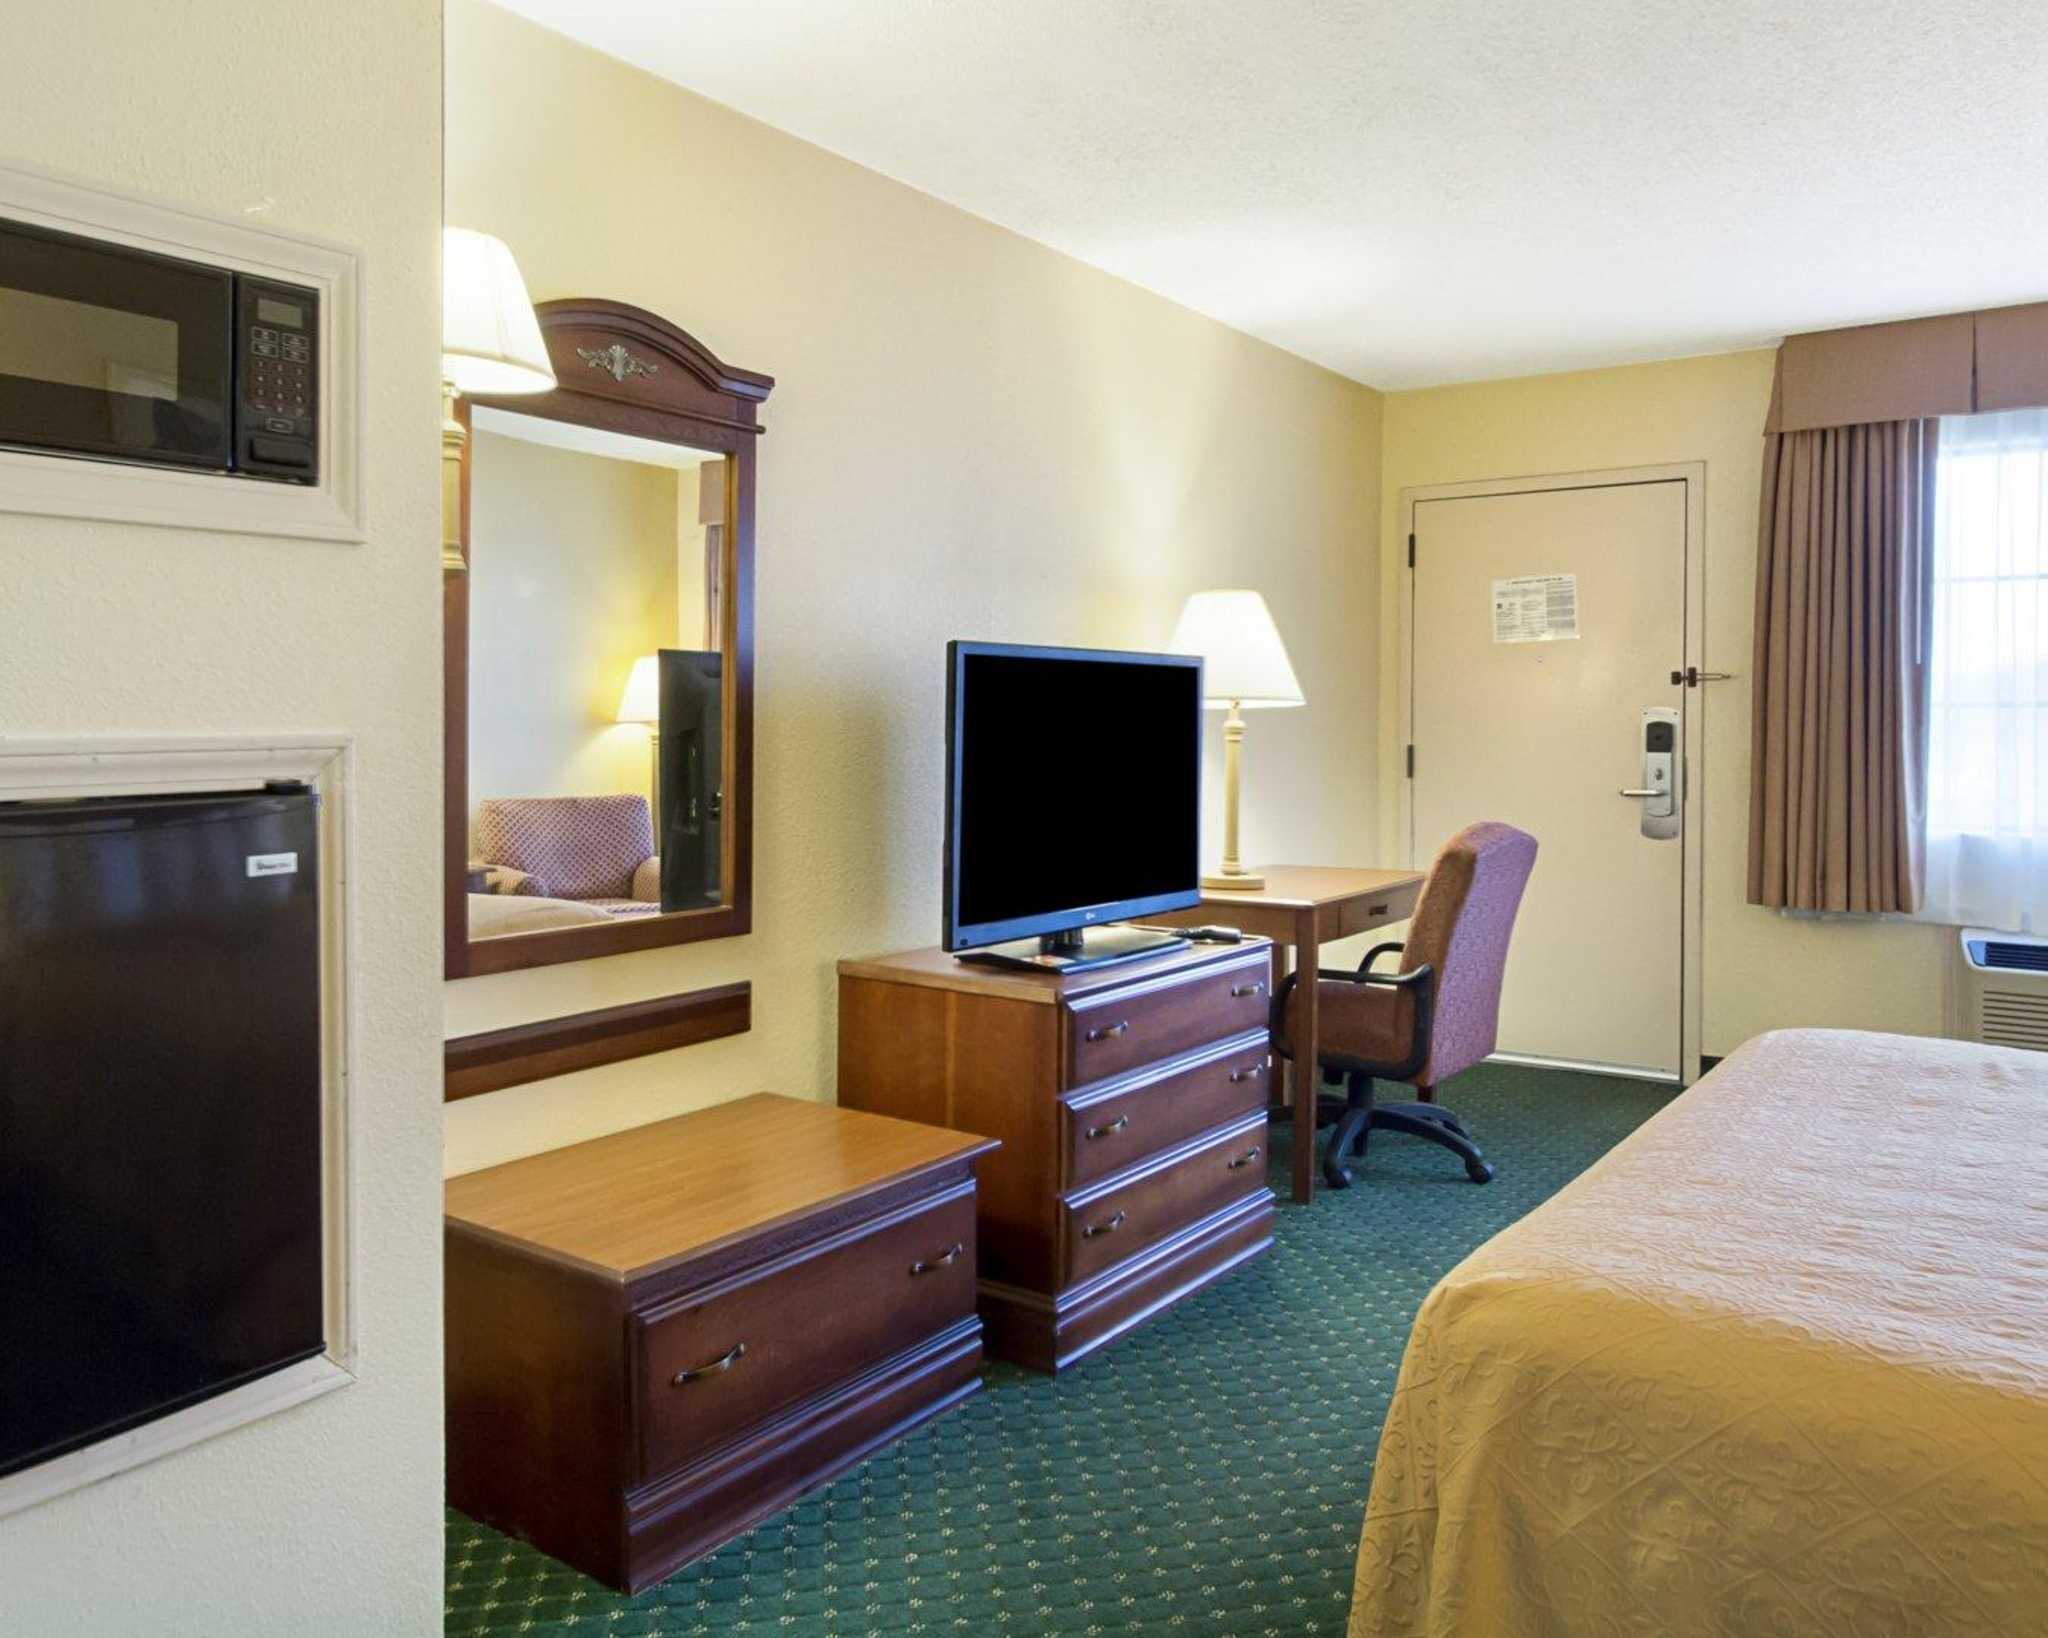 Quality Inn & Suites Southwest image 33